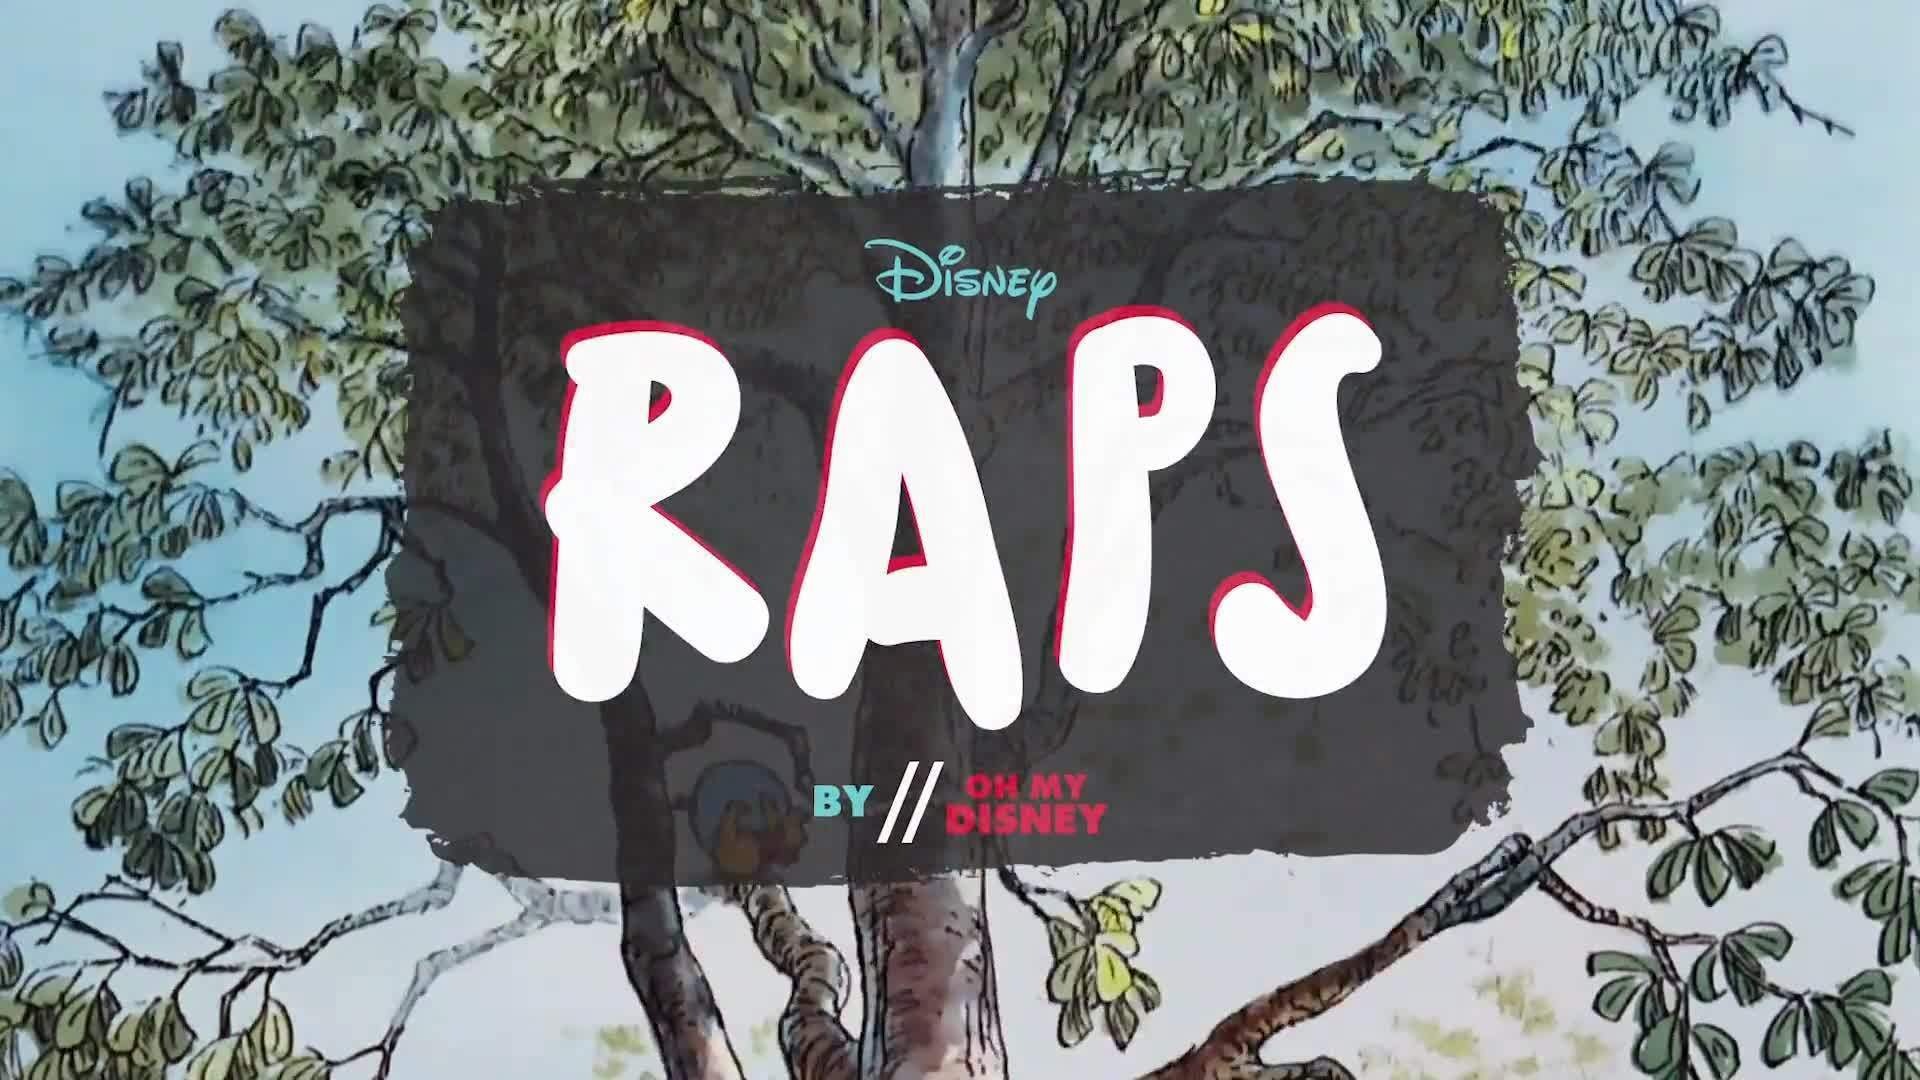 Winnie the Pooh | Disney Raps